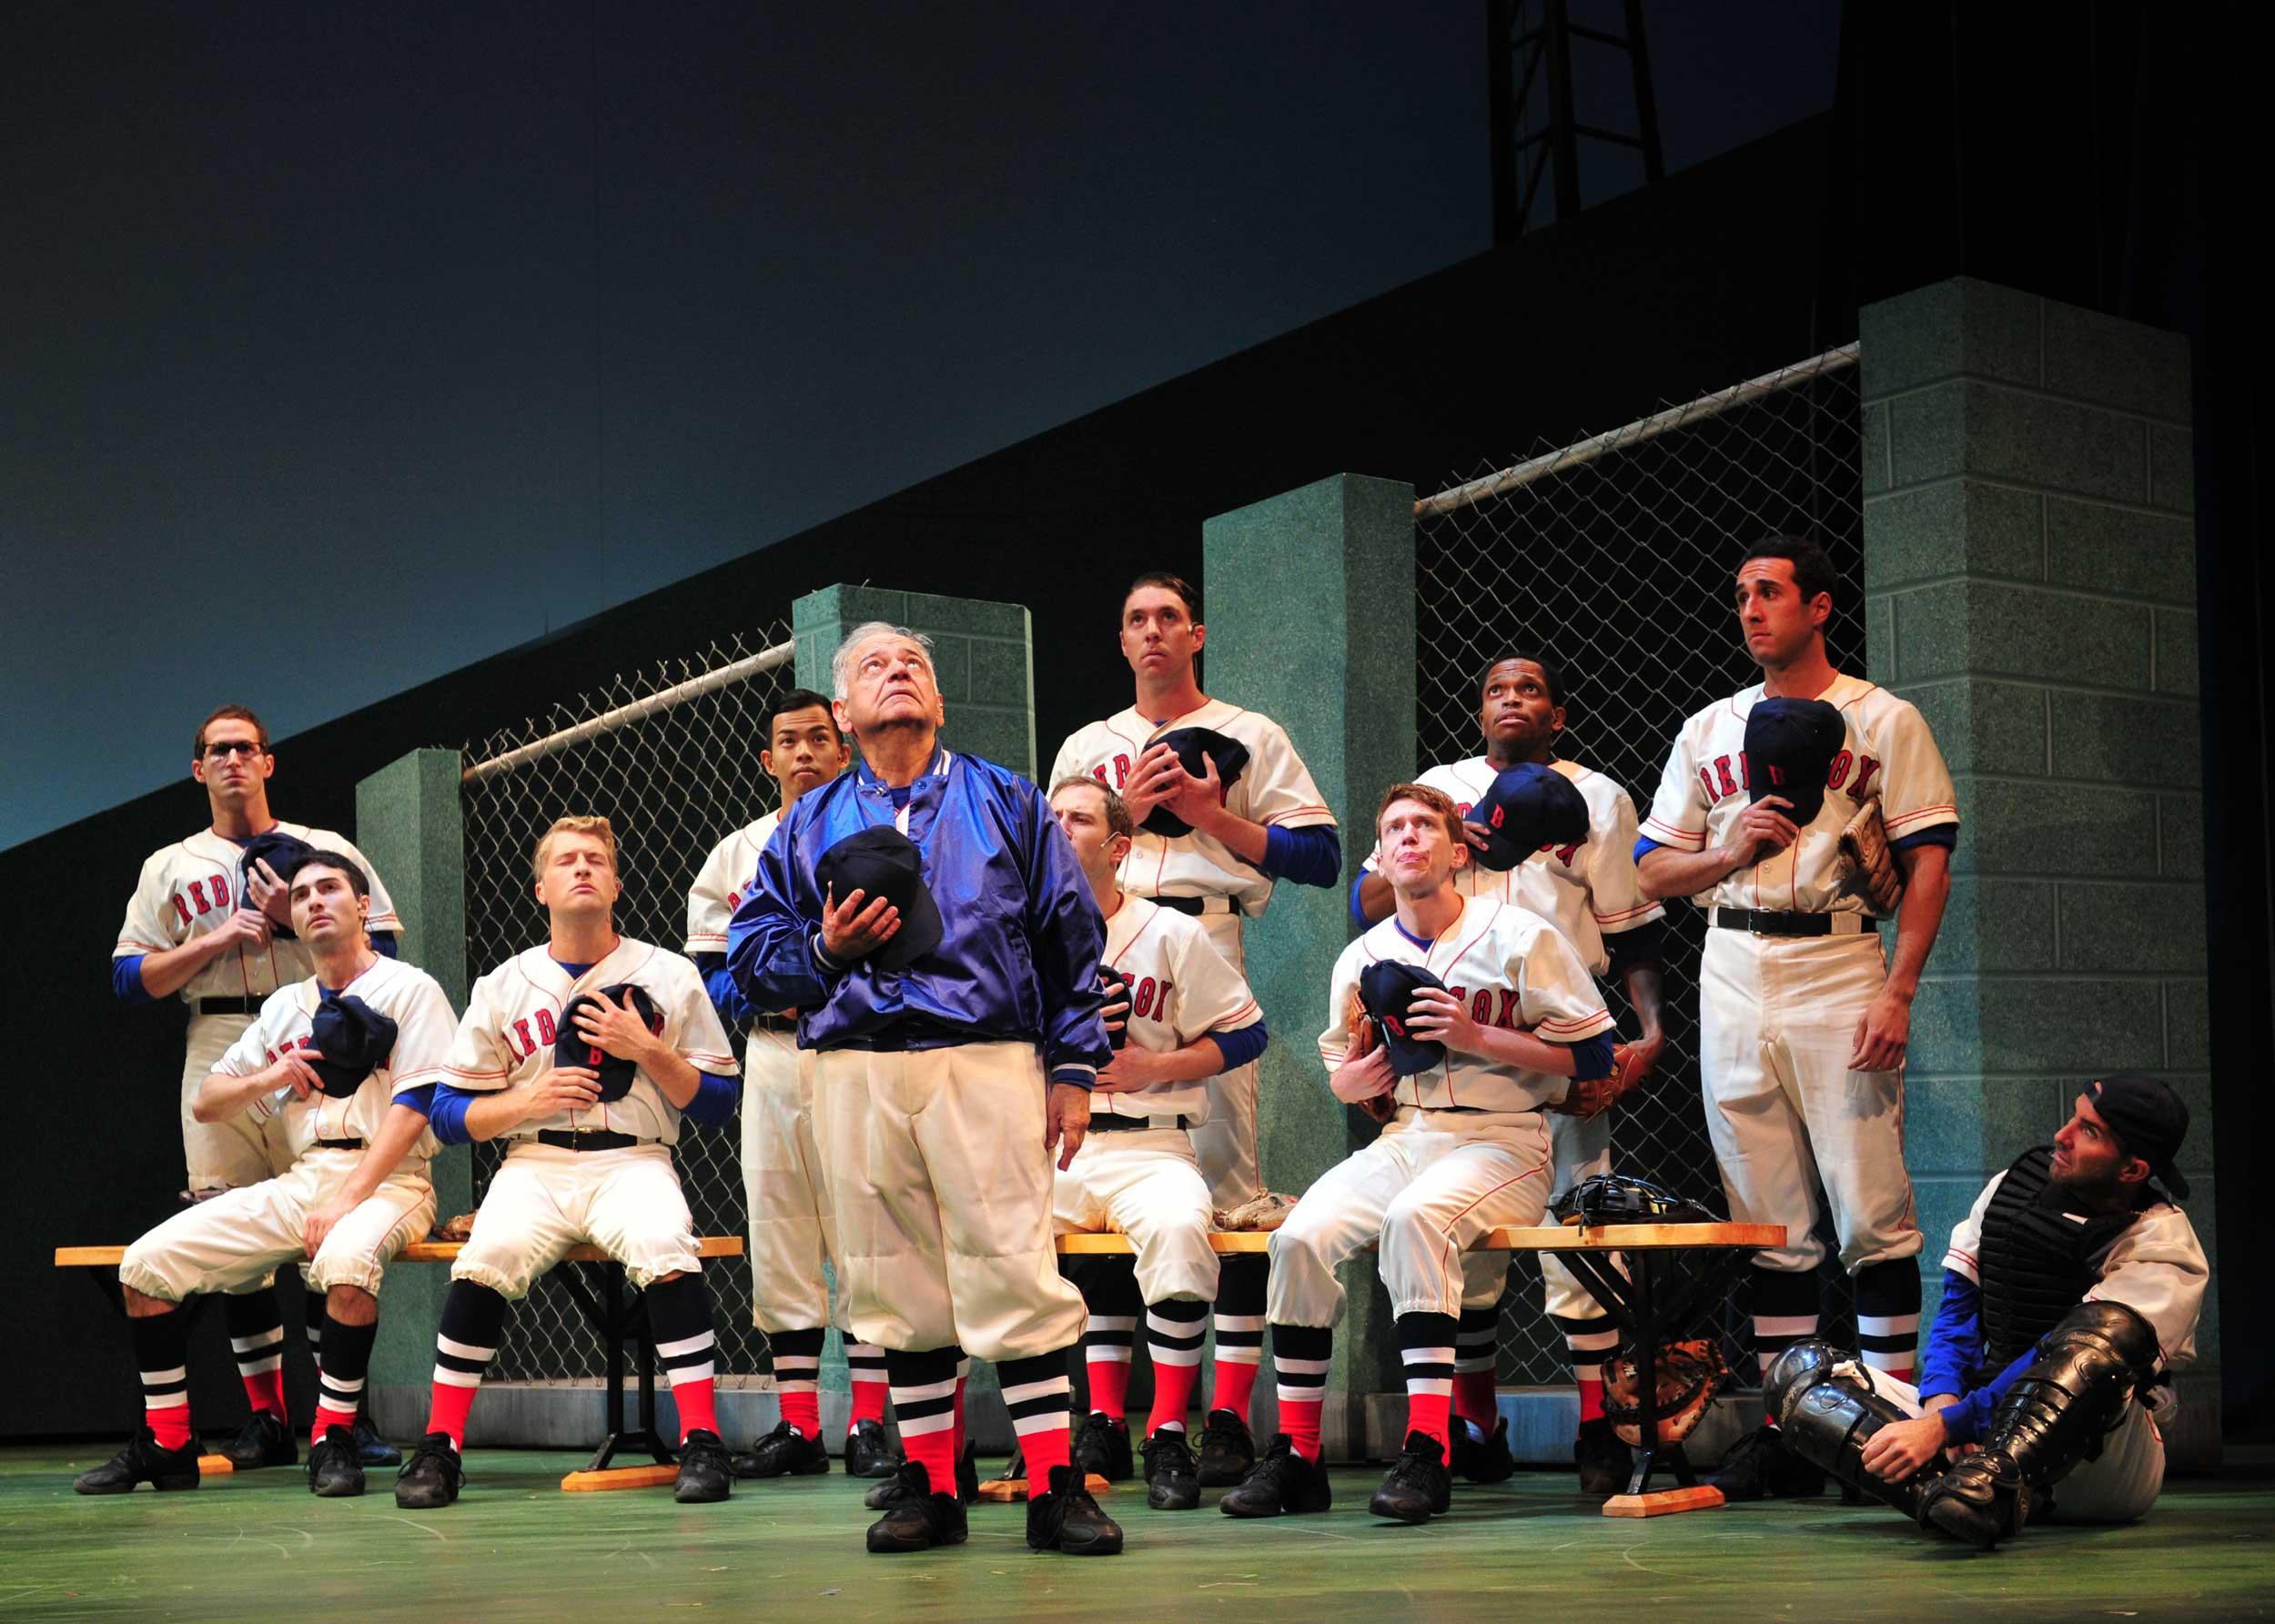 2012_OP_Damn-Yankees_Ray-DeMattis_DSC_2679_RGB_02-copy.jpg